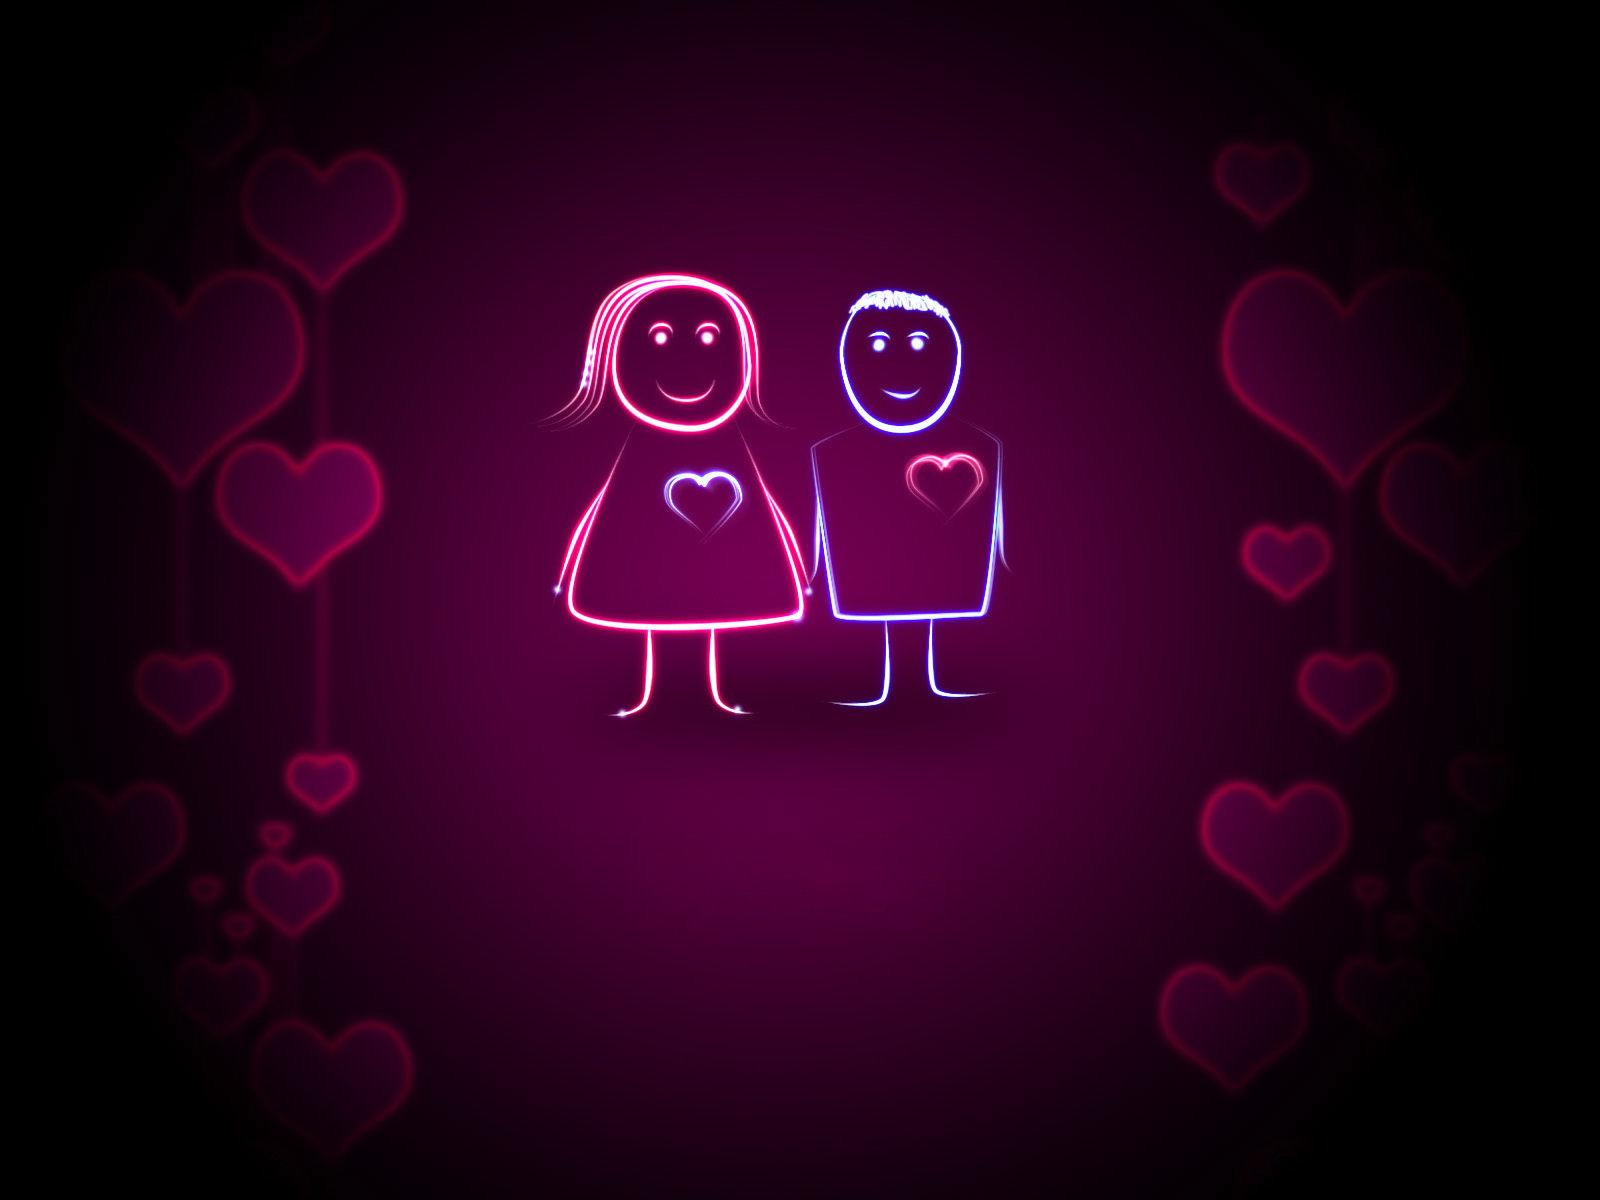 Best Imagenes De Amor En Movimiento 3d Con Frases Image Collection